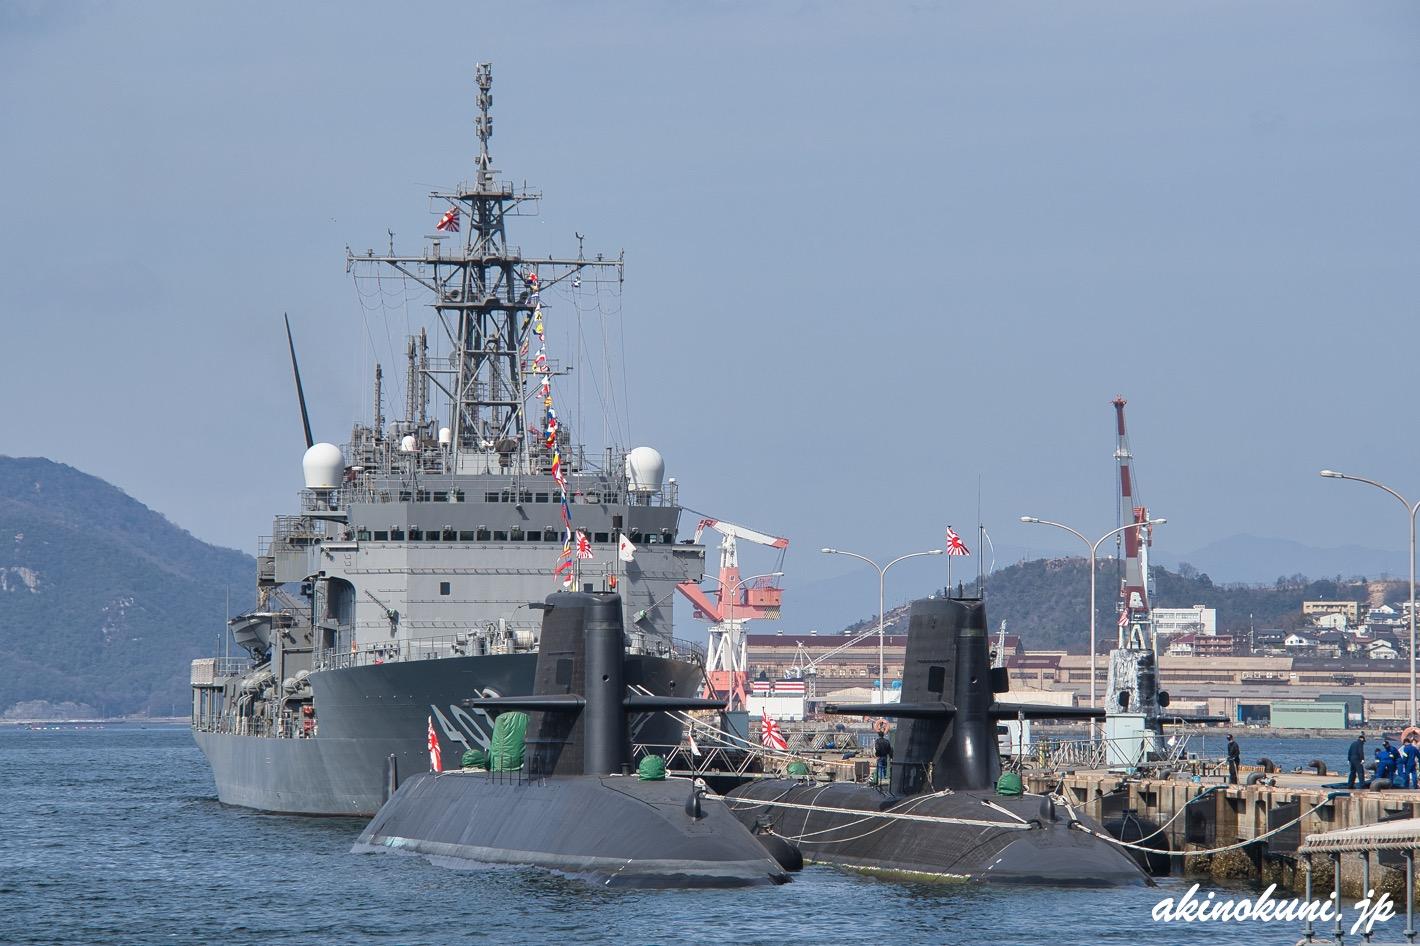 Sバースのちはや(ASR-403)と潜水艦